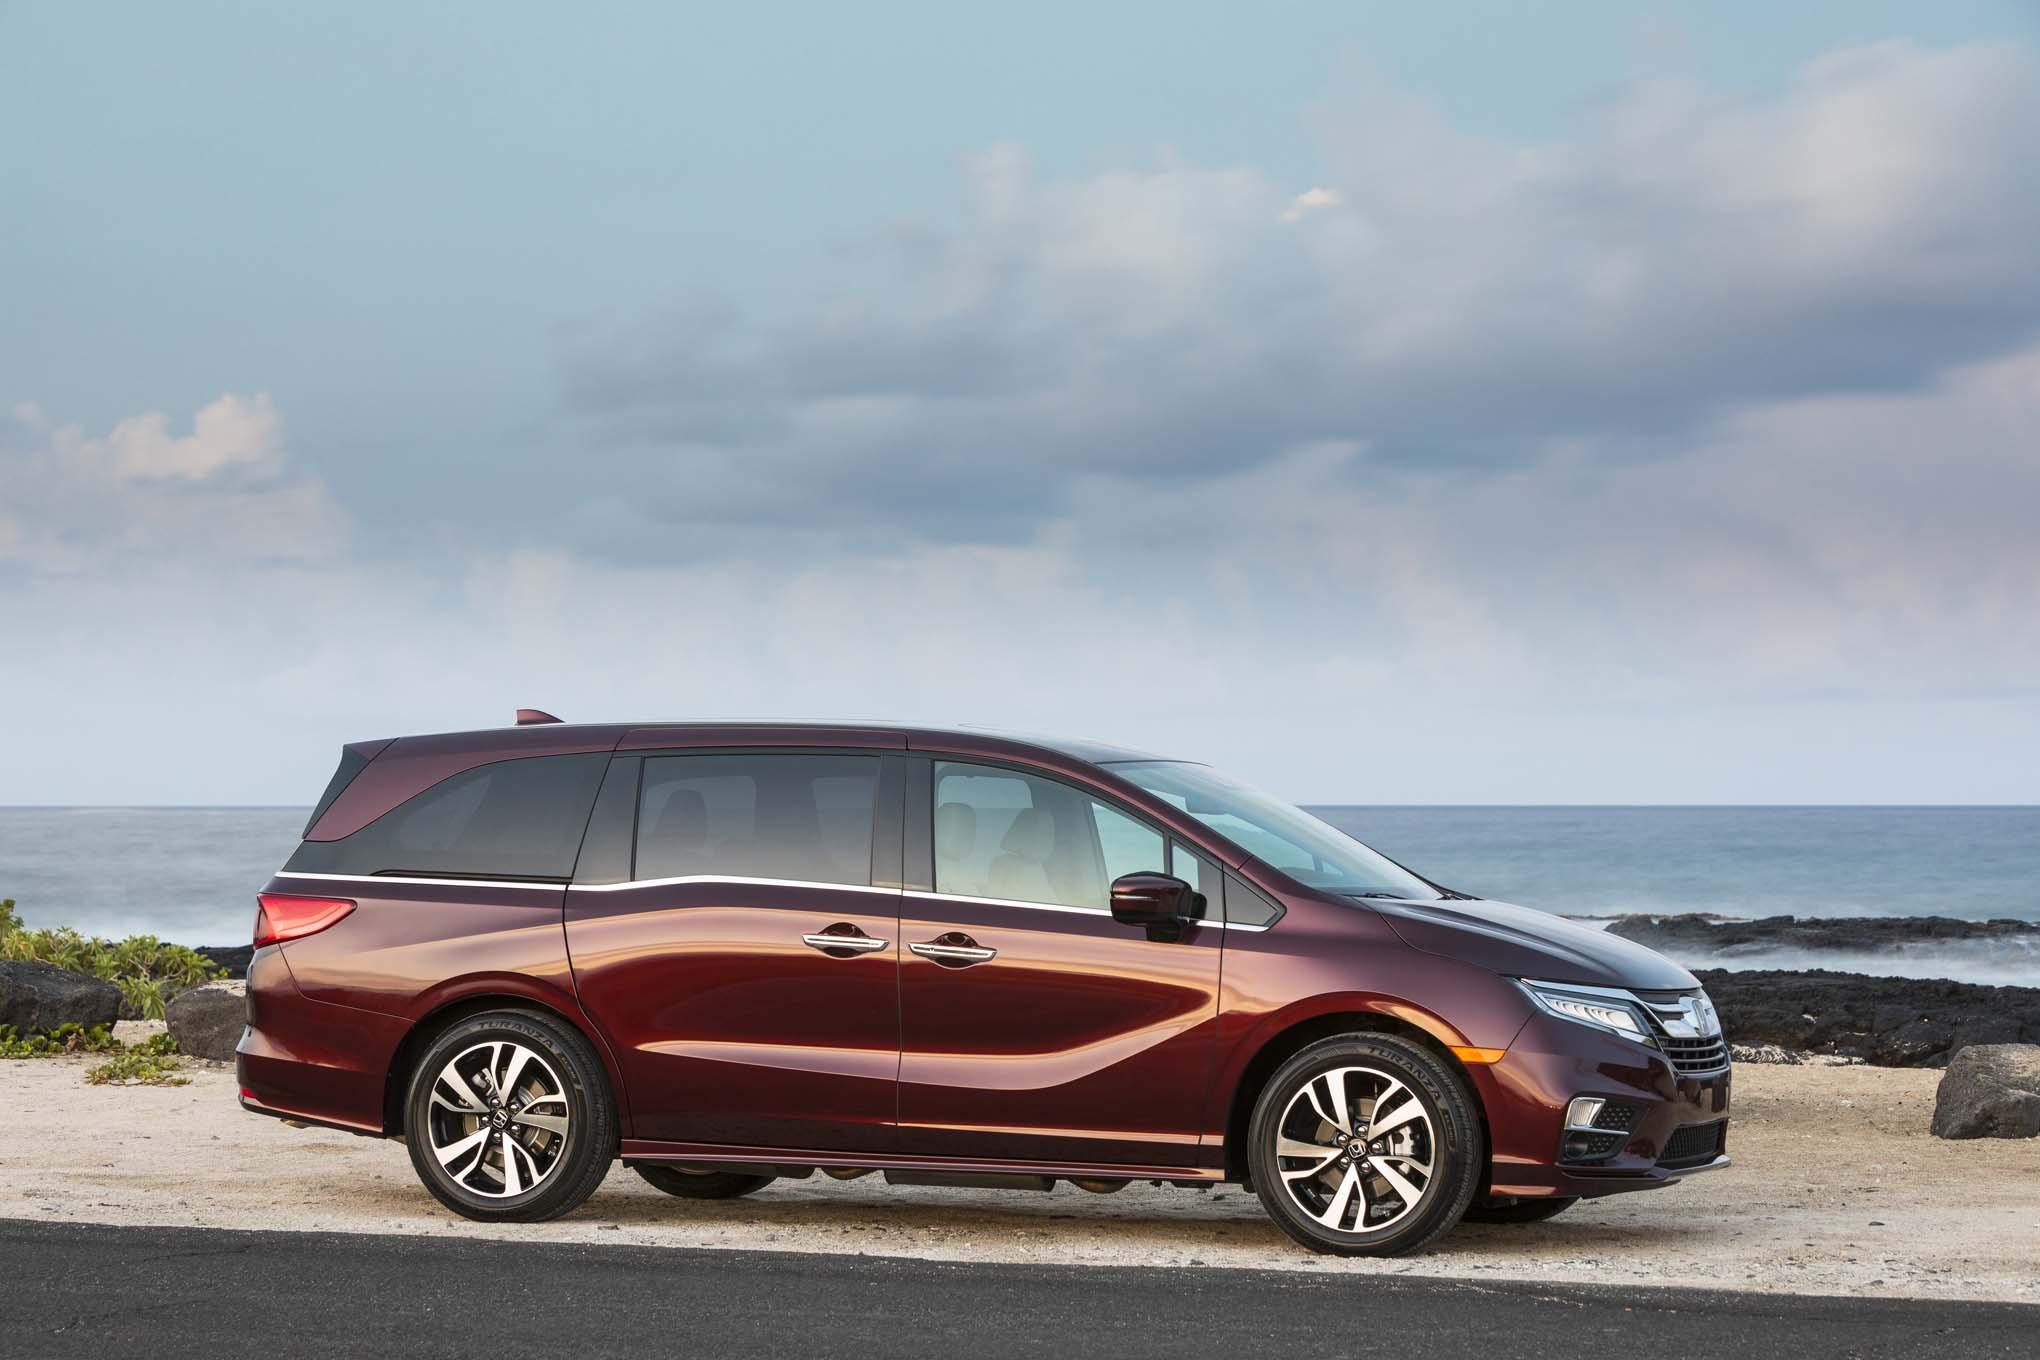 2018 Honda Odyssey Front Three Quarter 07